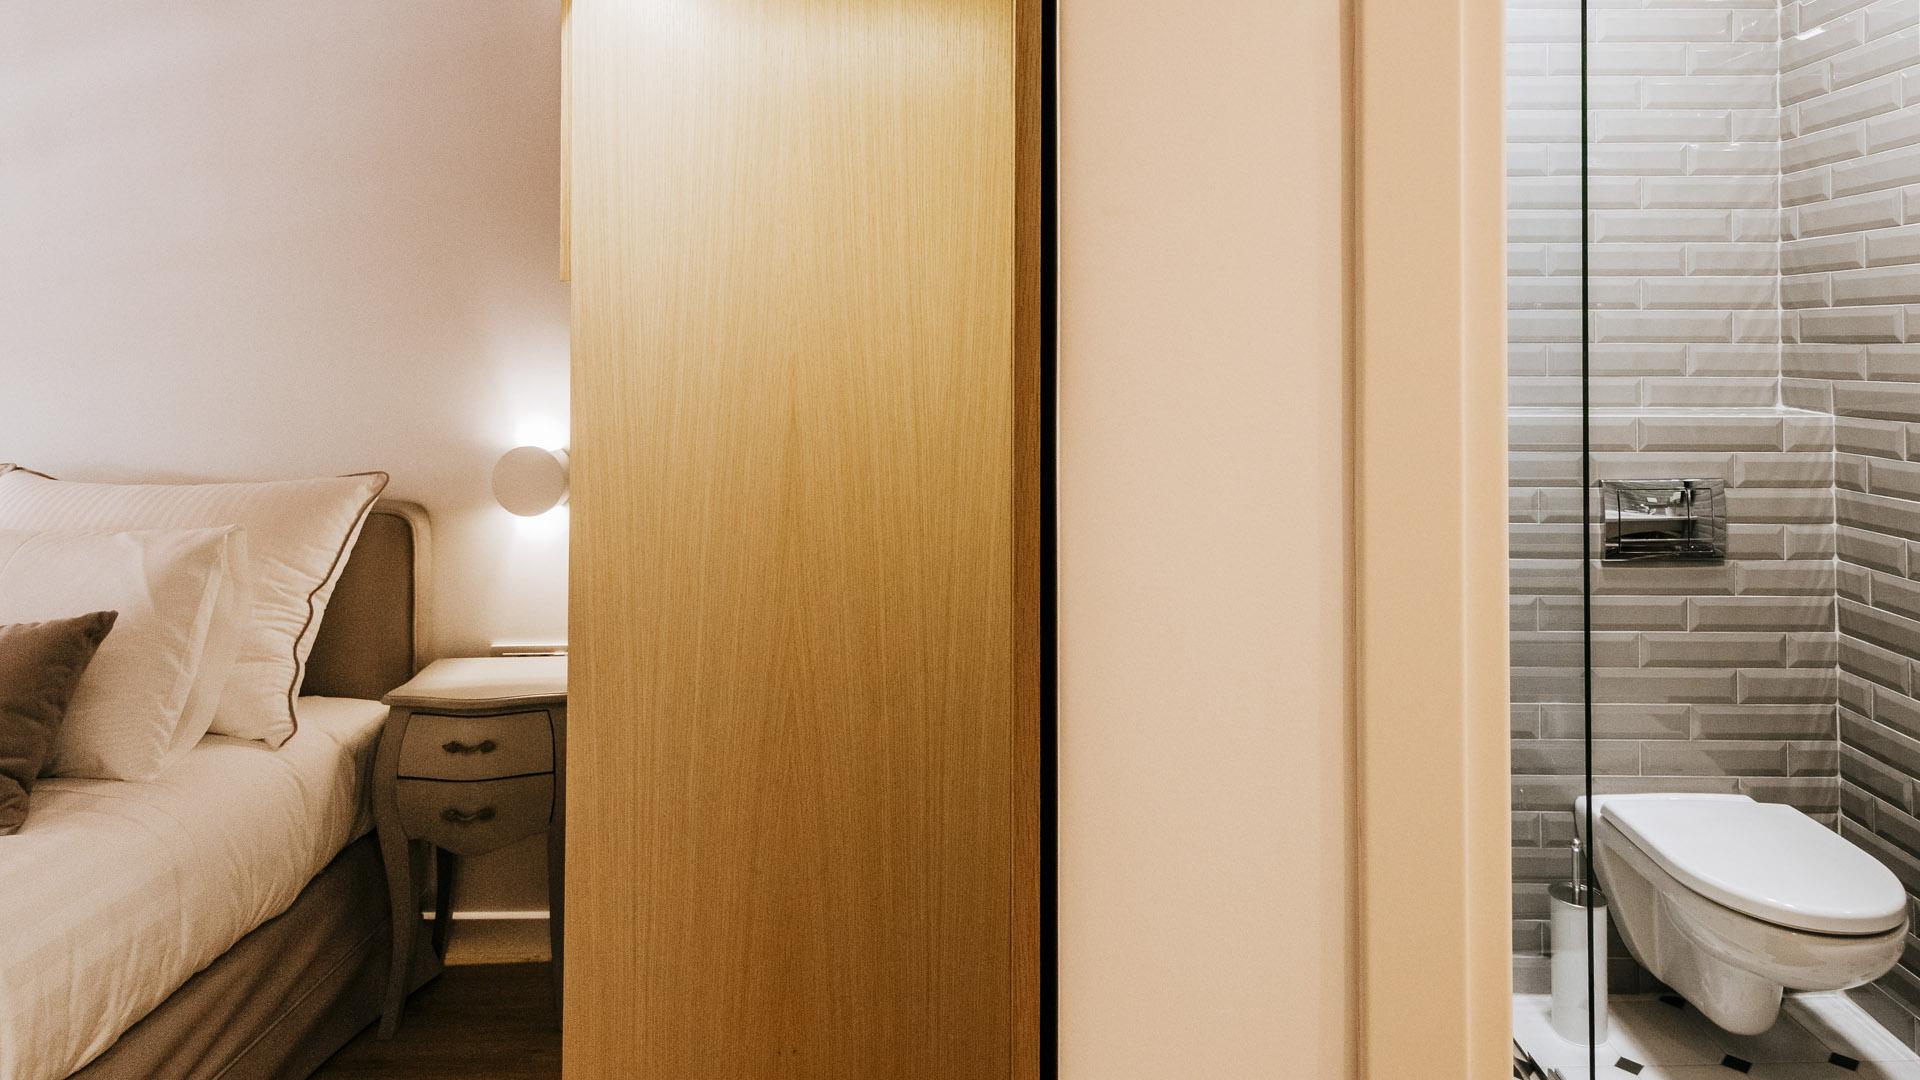 http://itskale-hotel.gr/demo/wp-content/uploads/2015/07/DSC_5987.jpg